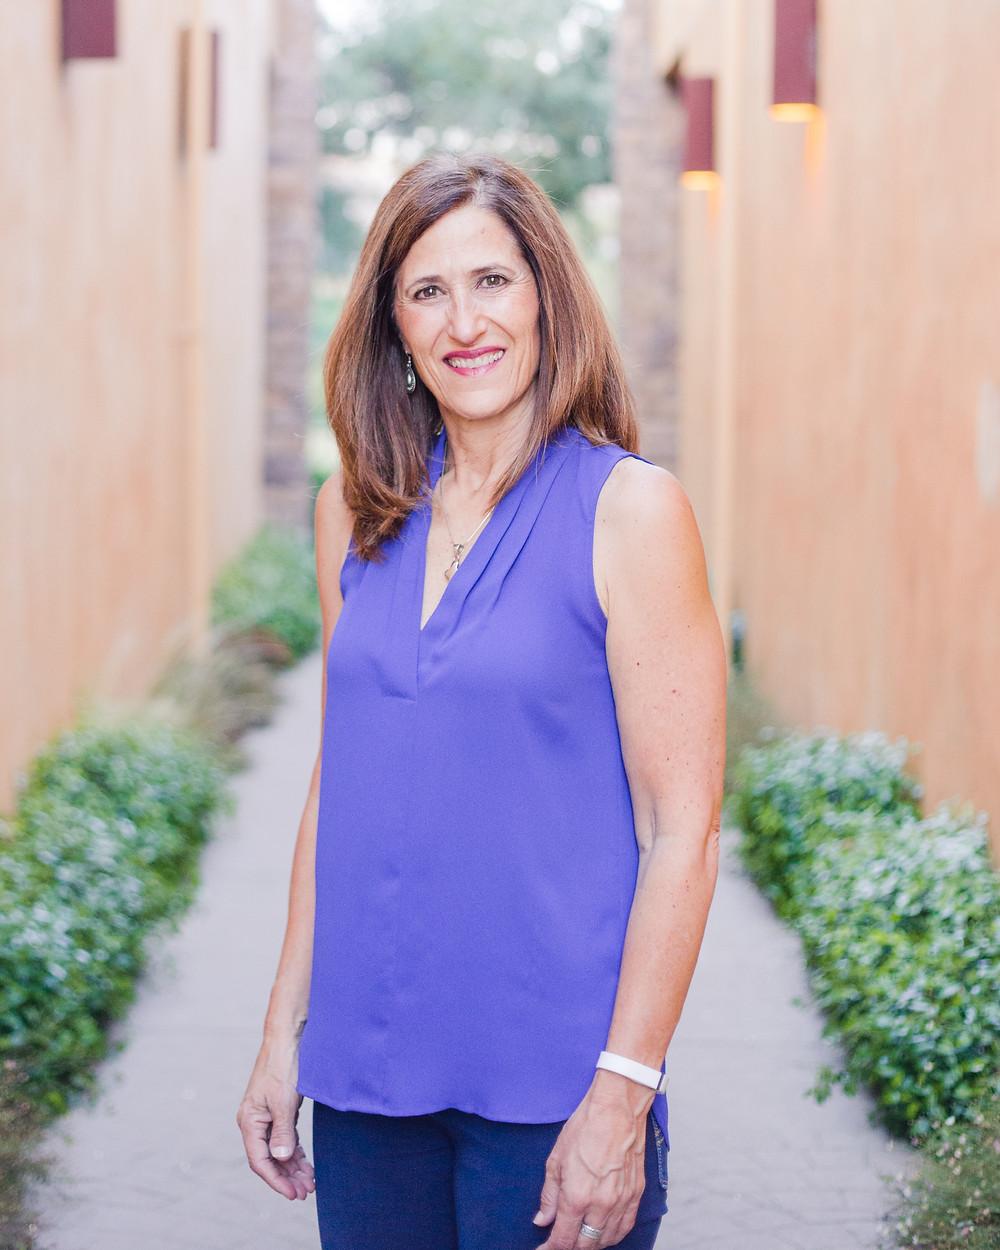 Sharon Cesena, El Dorado Hills, Cultivate, Women's conference, Journaling